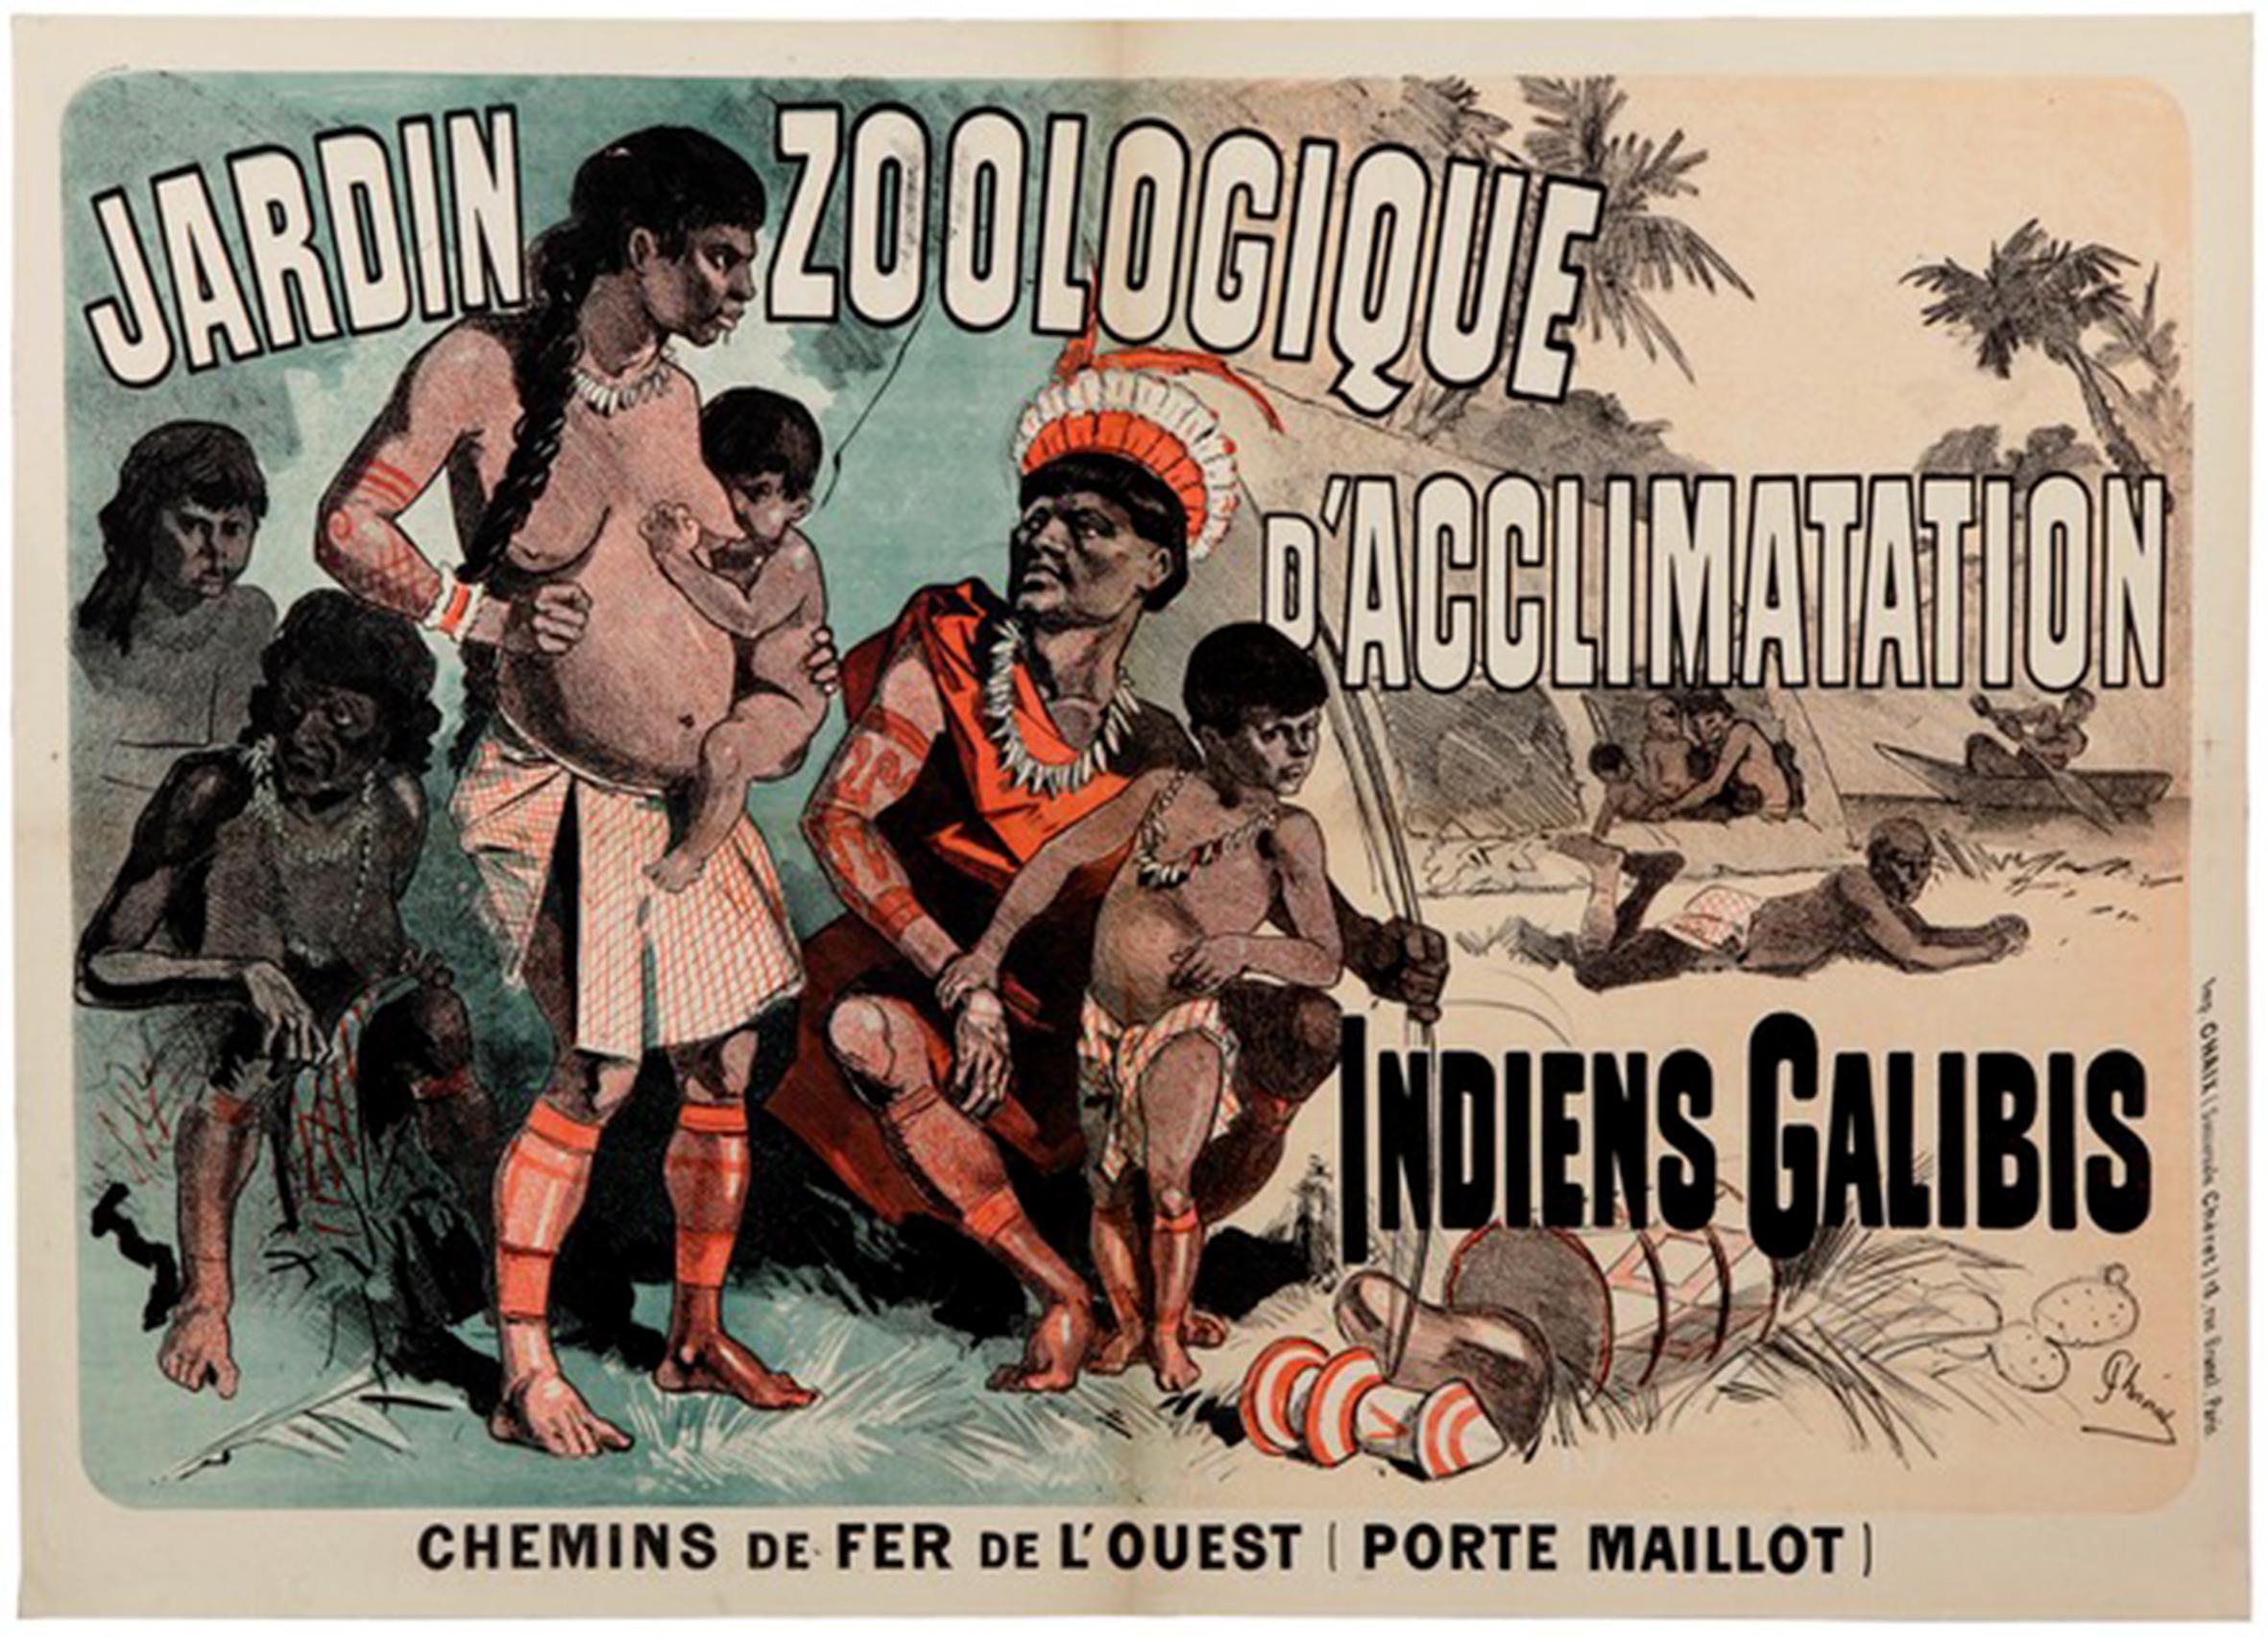 Den menneskelige zoo